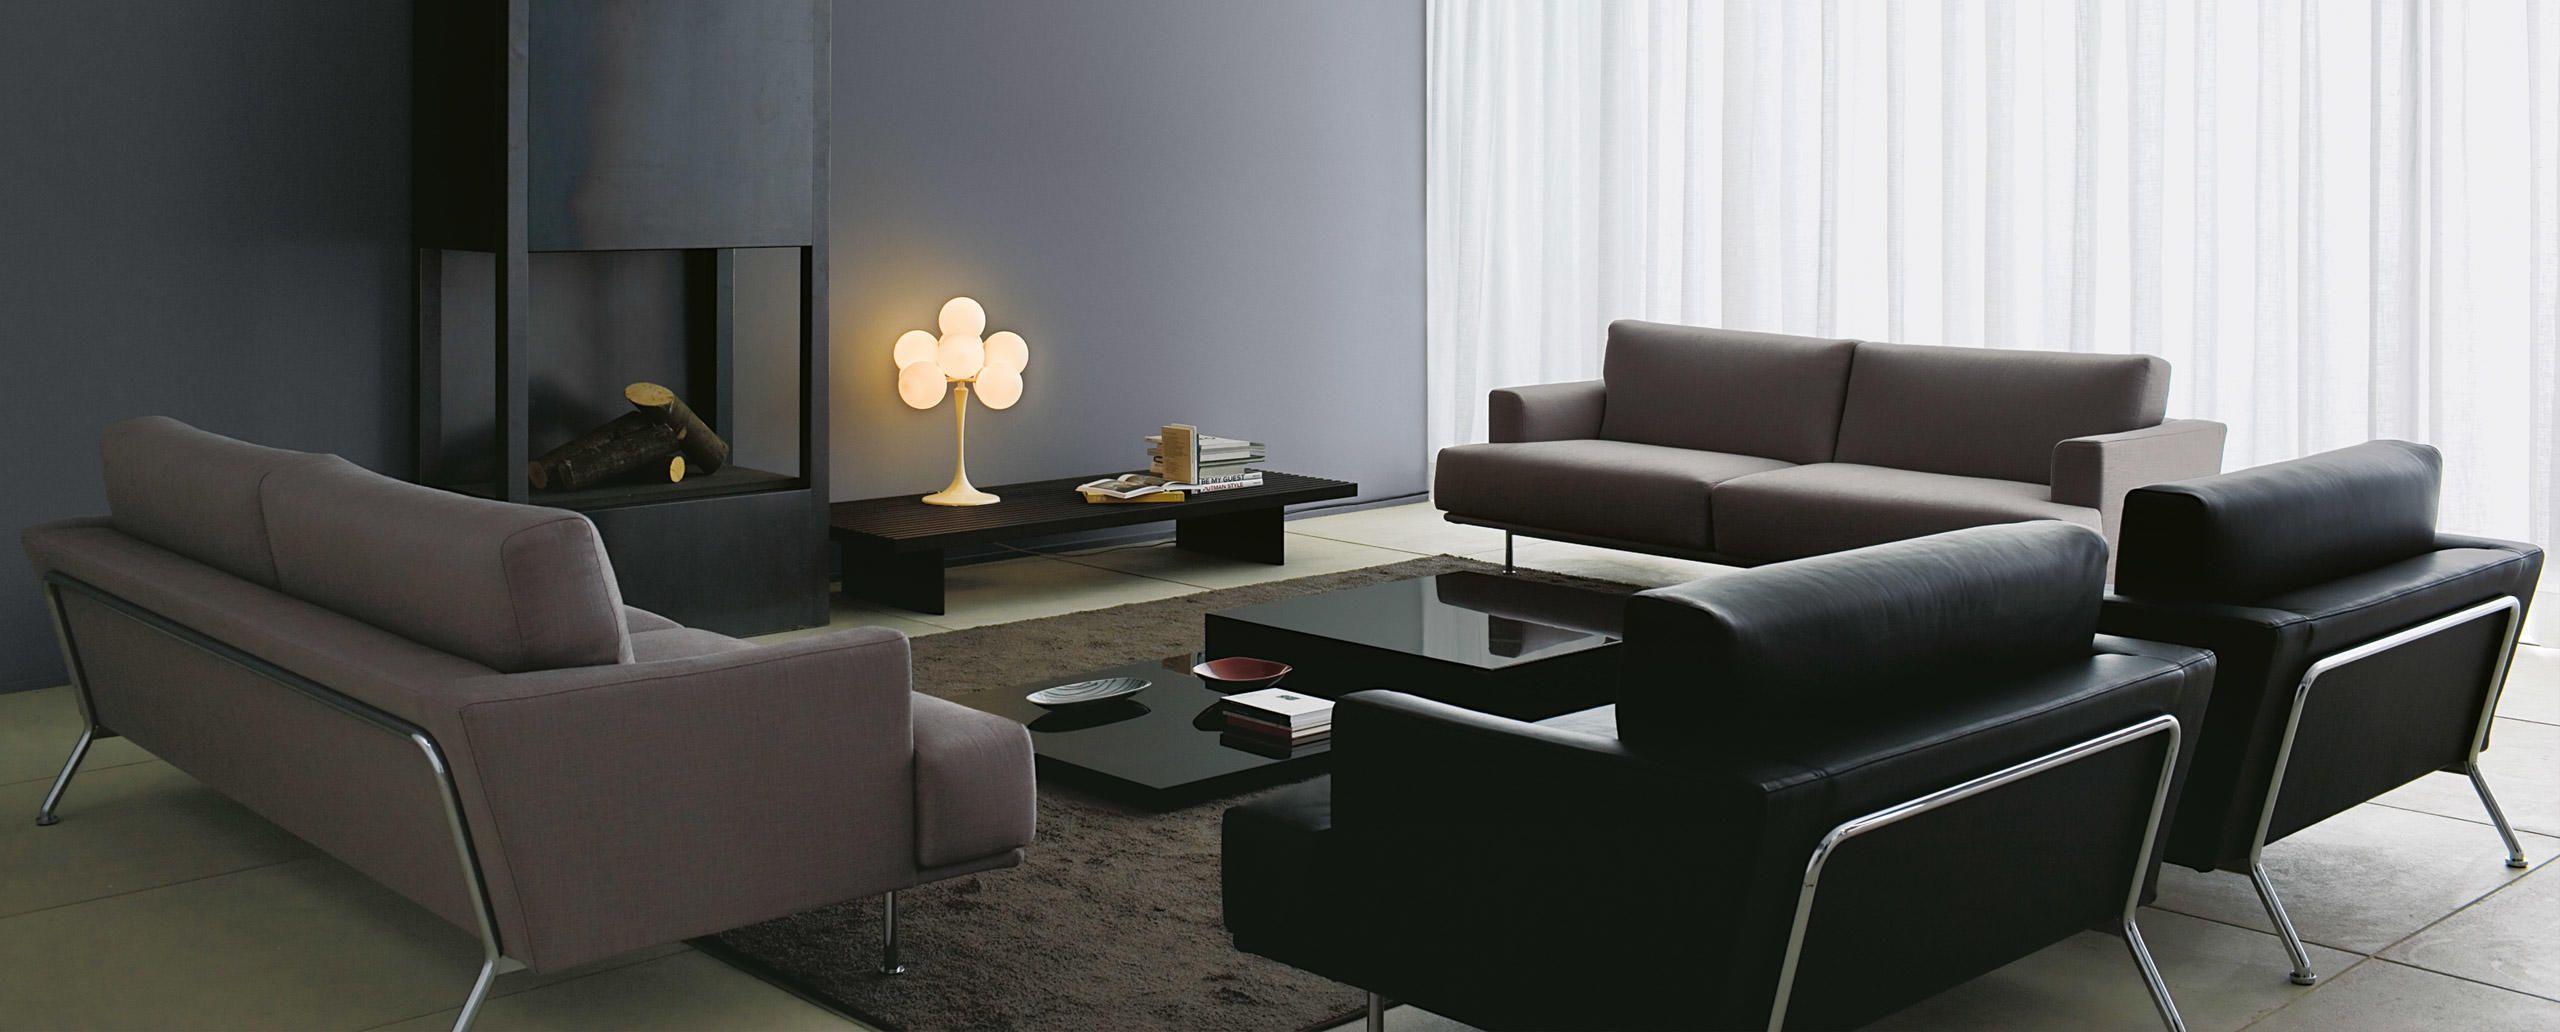 Colombo Divani A Meda designer sofas and modern chaise longues | design divano